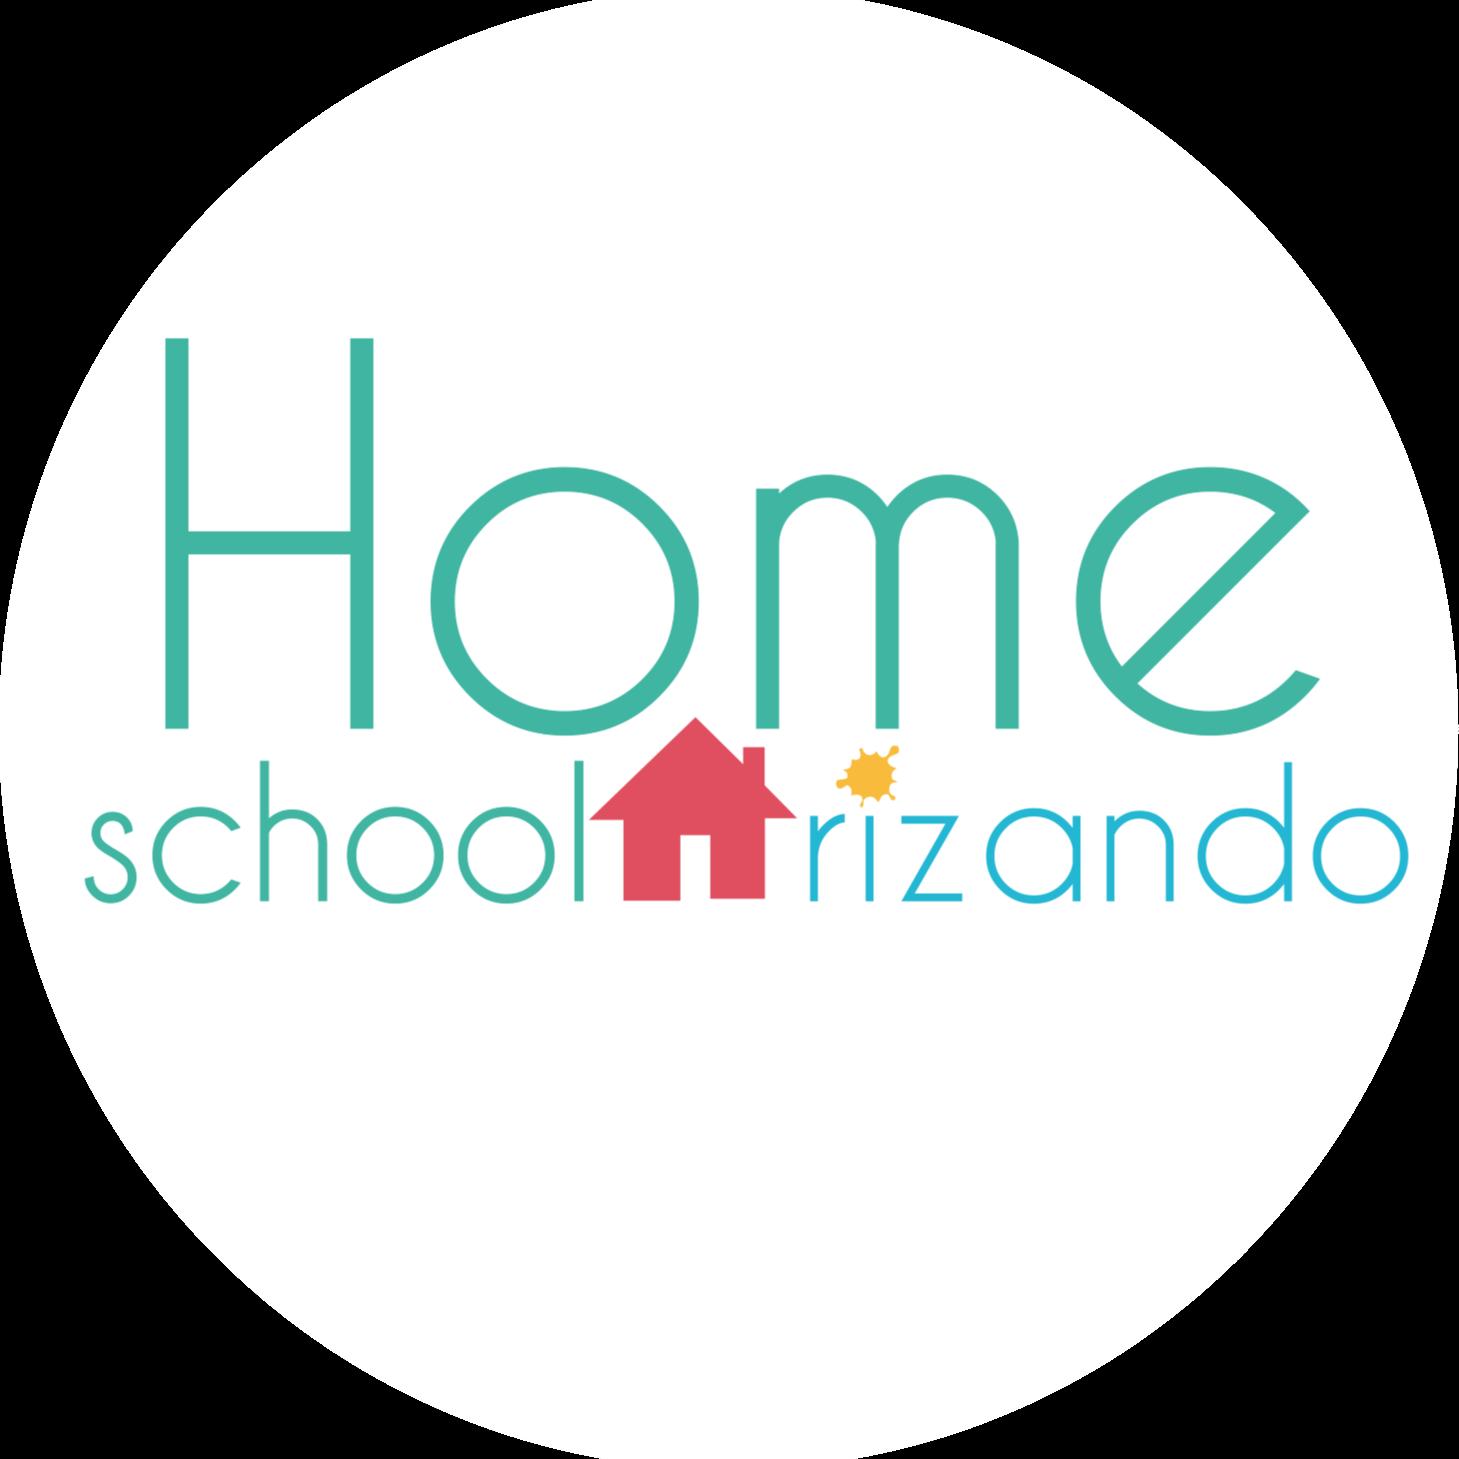 @Homeschoolarizando Profile Image | Linktree